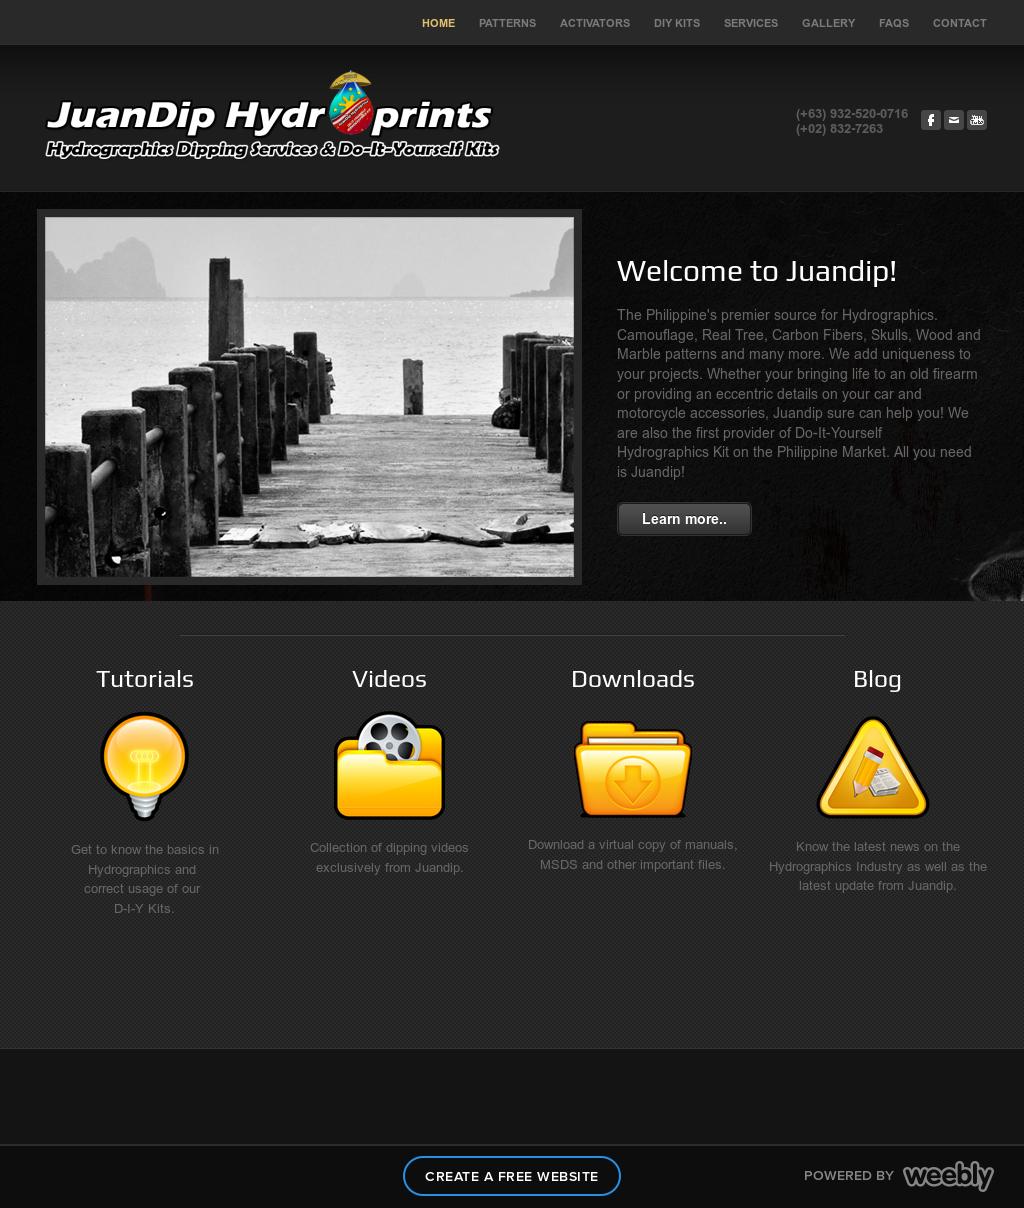 Juandip hydroprints hydrographics philippines hydrographics kit juandip hydroprints hydrographics philippines hydrographics kit website history solutioingenieria Choice Image